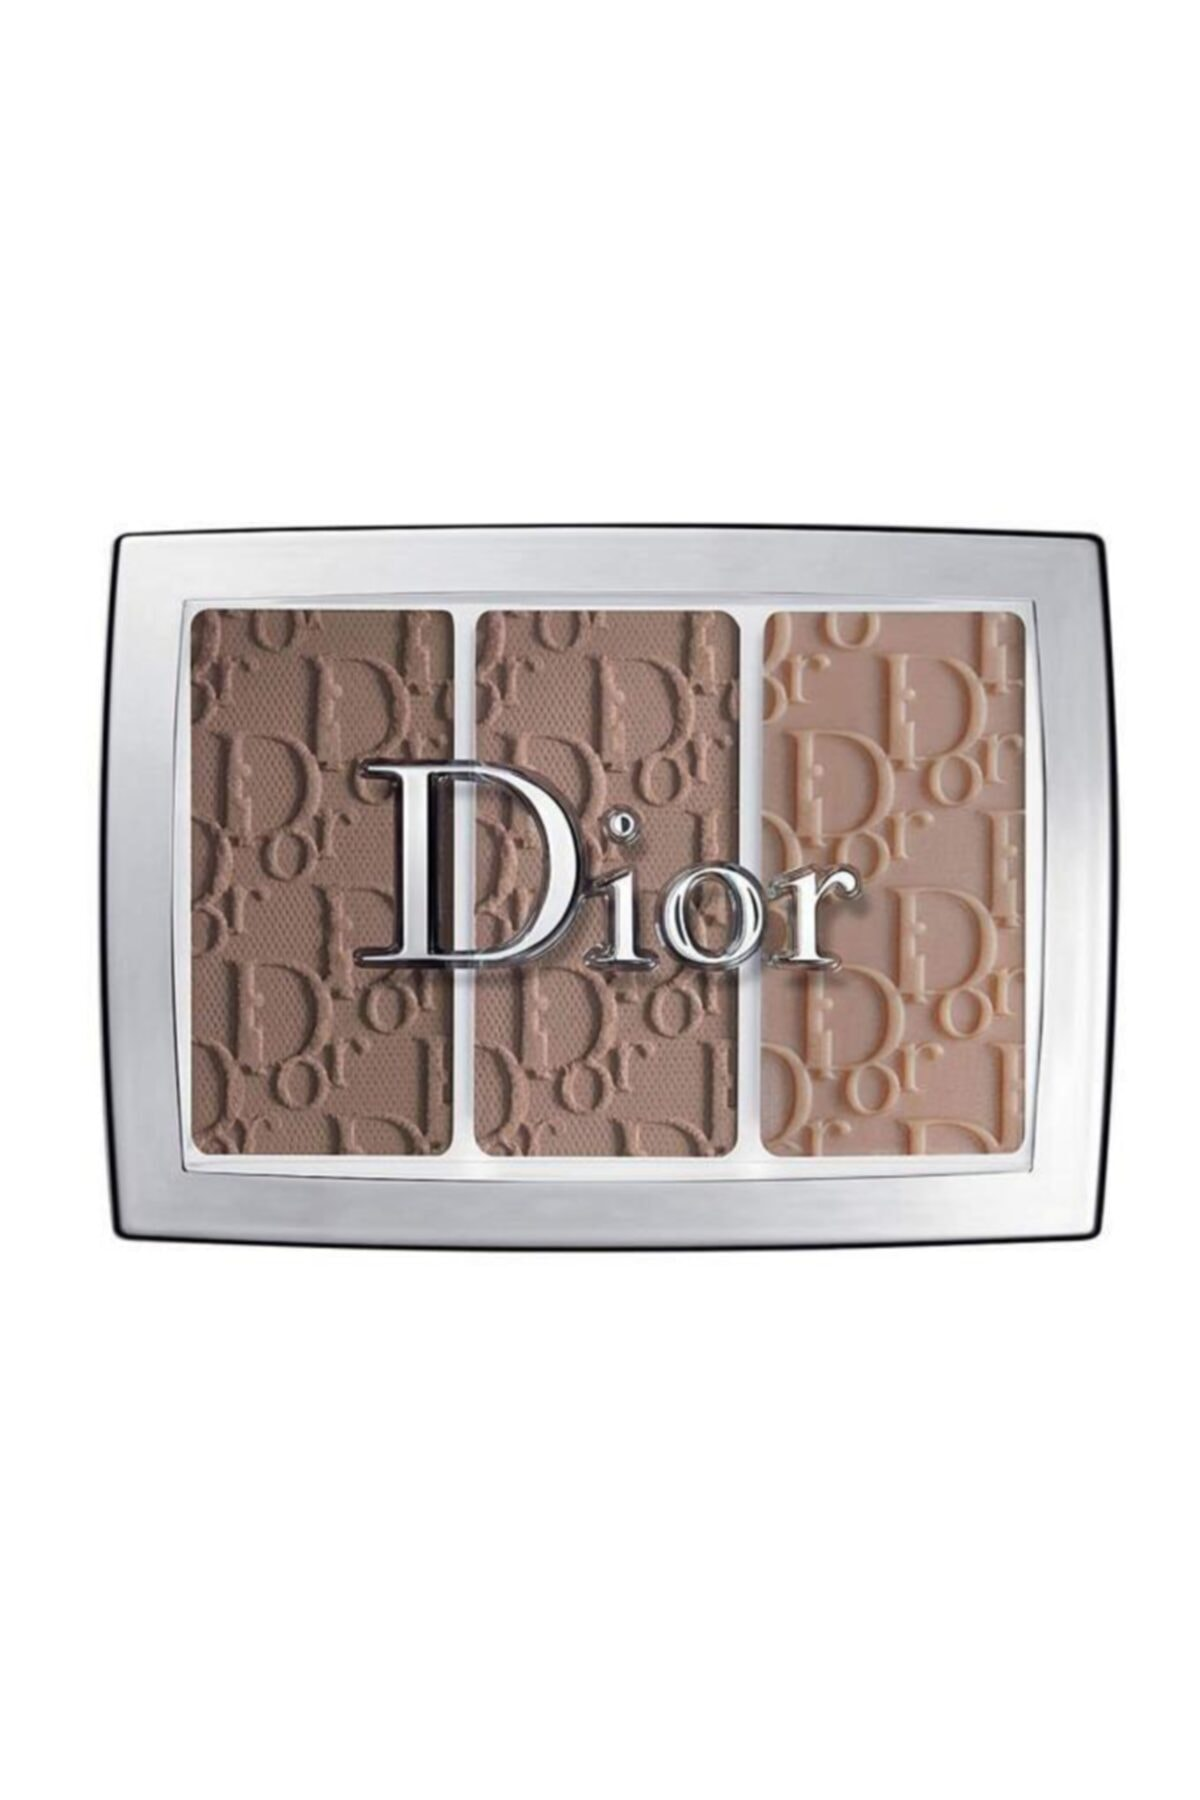 Dior Backstage Brow Palette 001 Light Kaş Paleti 1